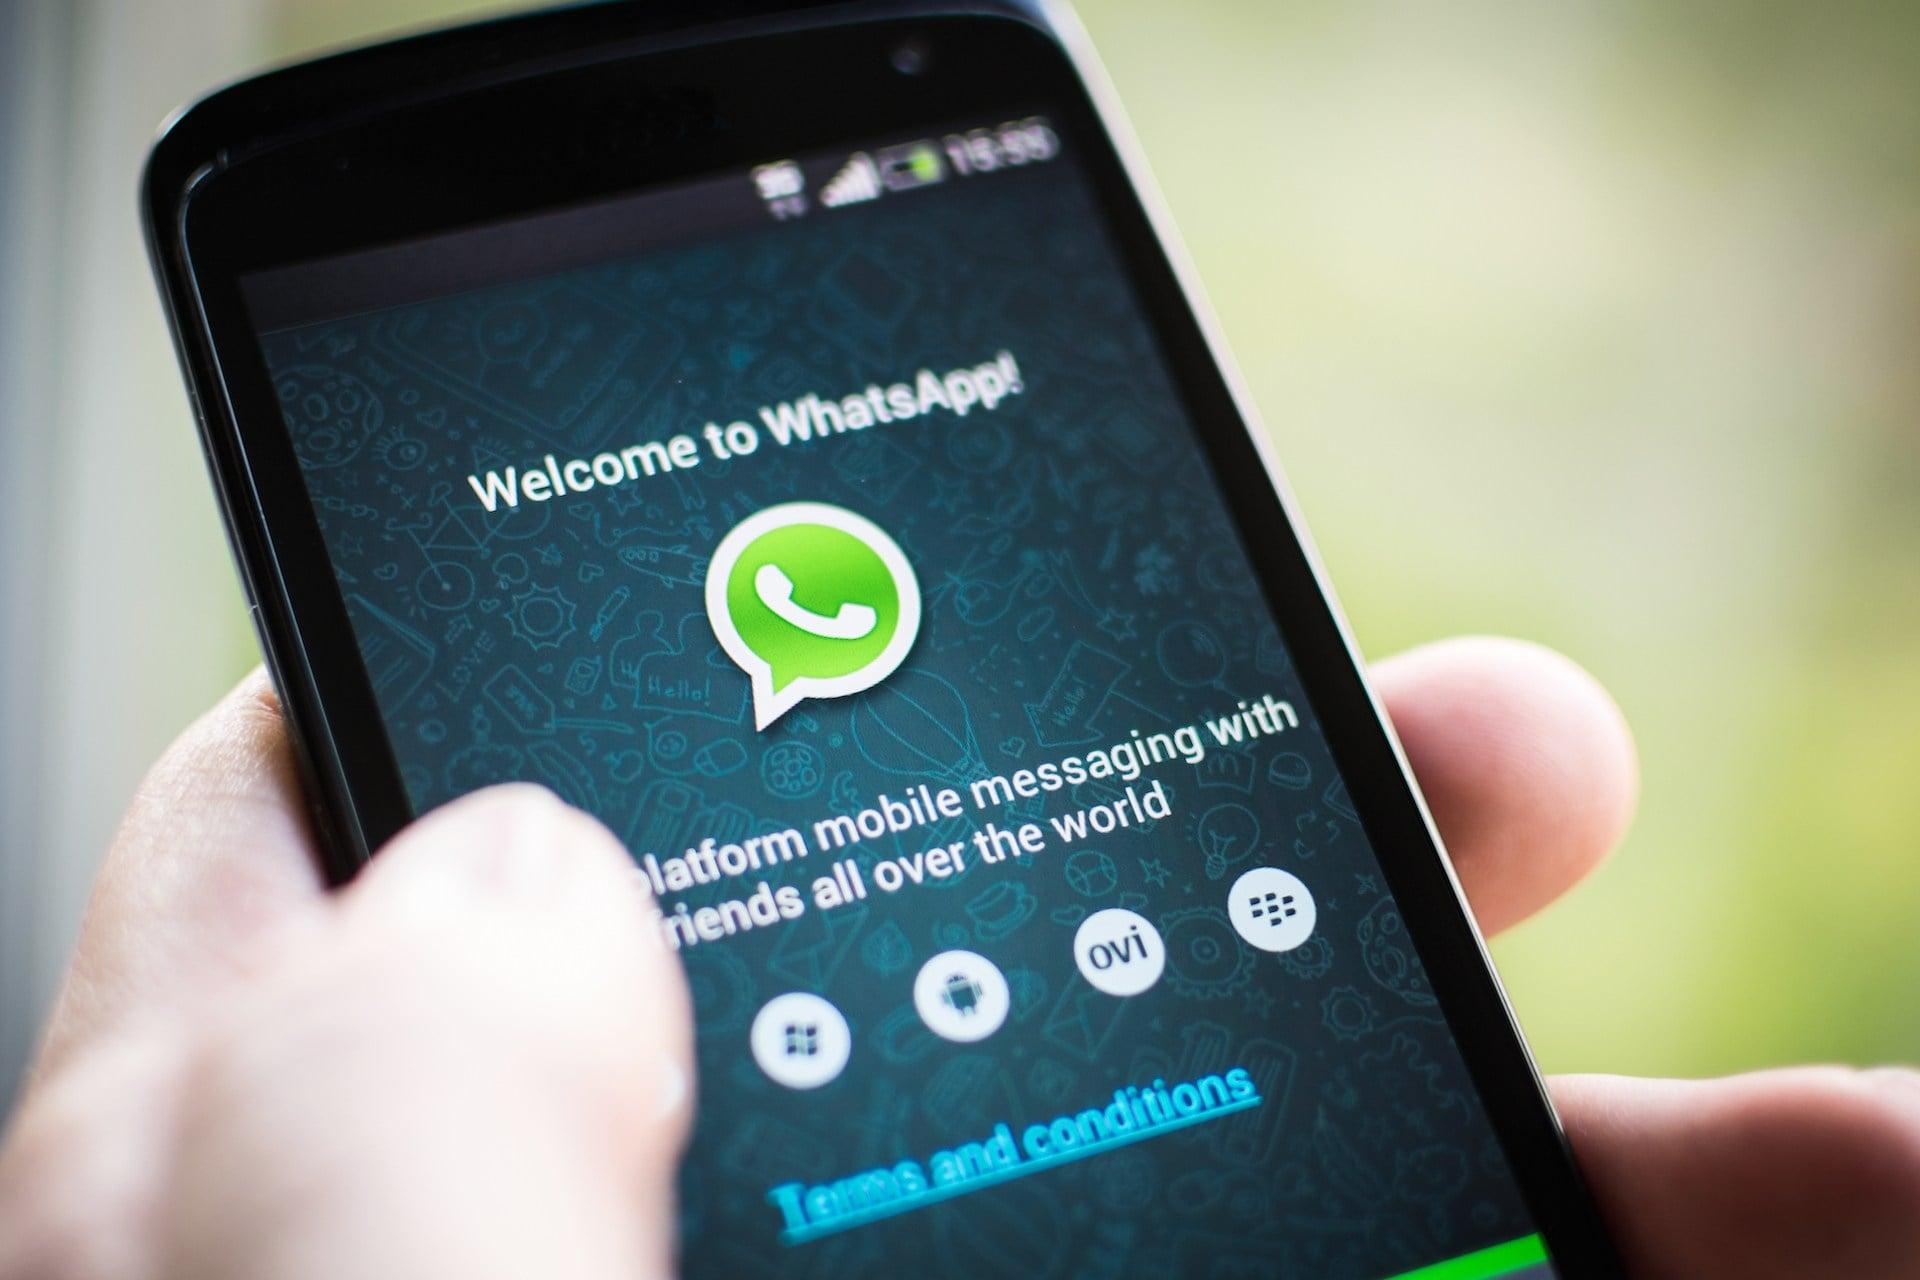 Whatsapp Hizmet Süresi Whatsapp Hizmet Süresi Whatsapp Hizmet Süresi Whatsapp